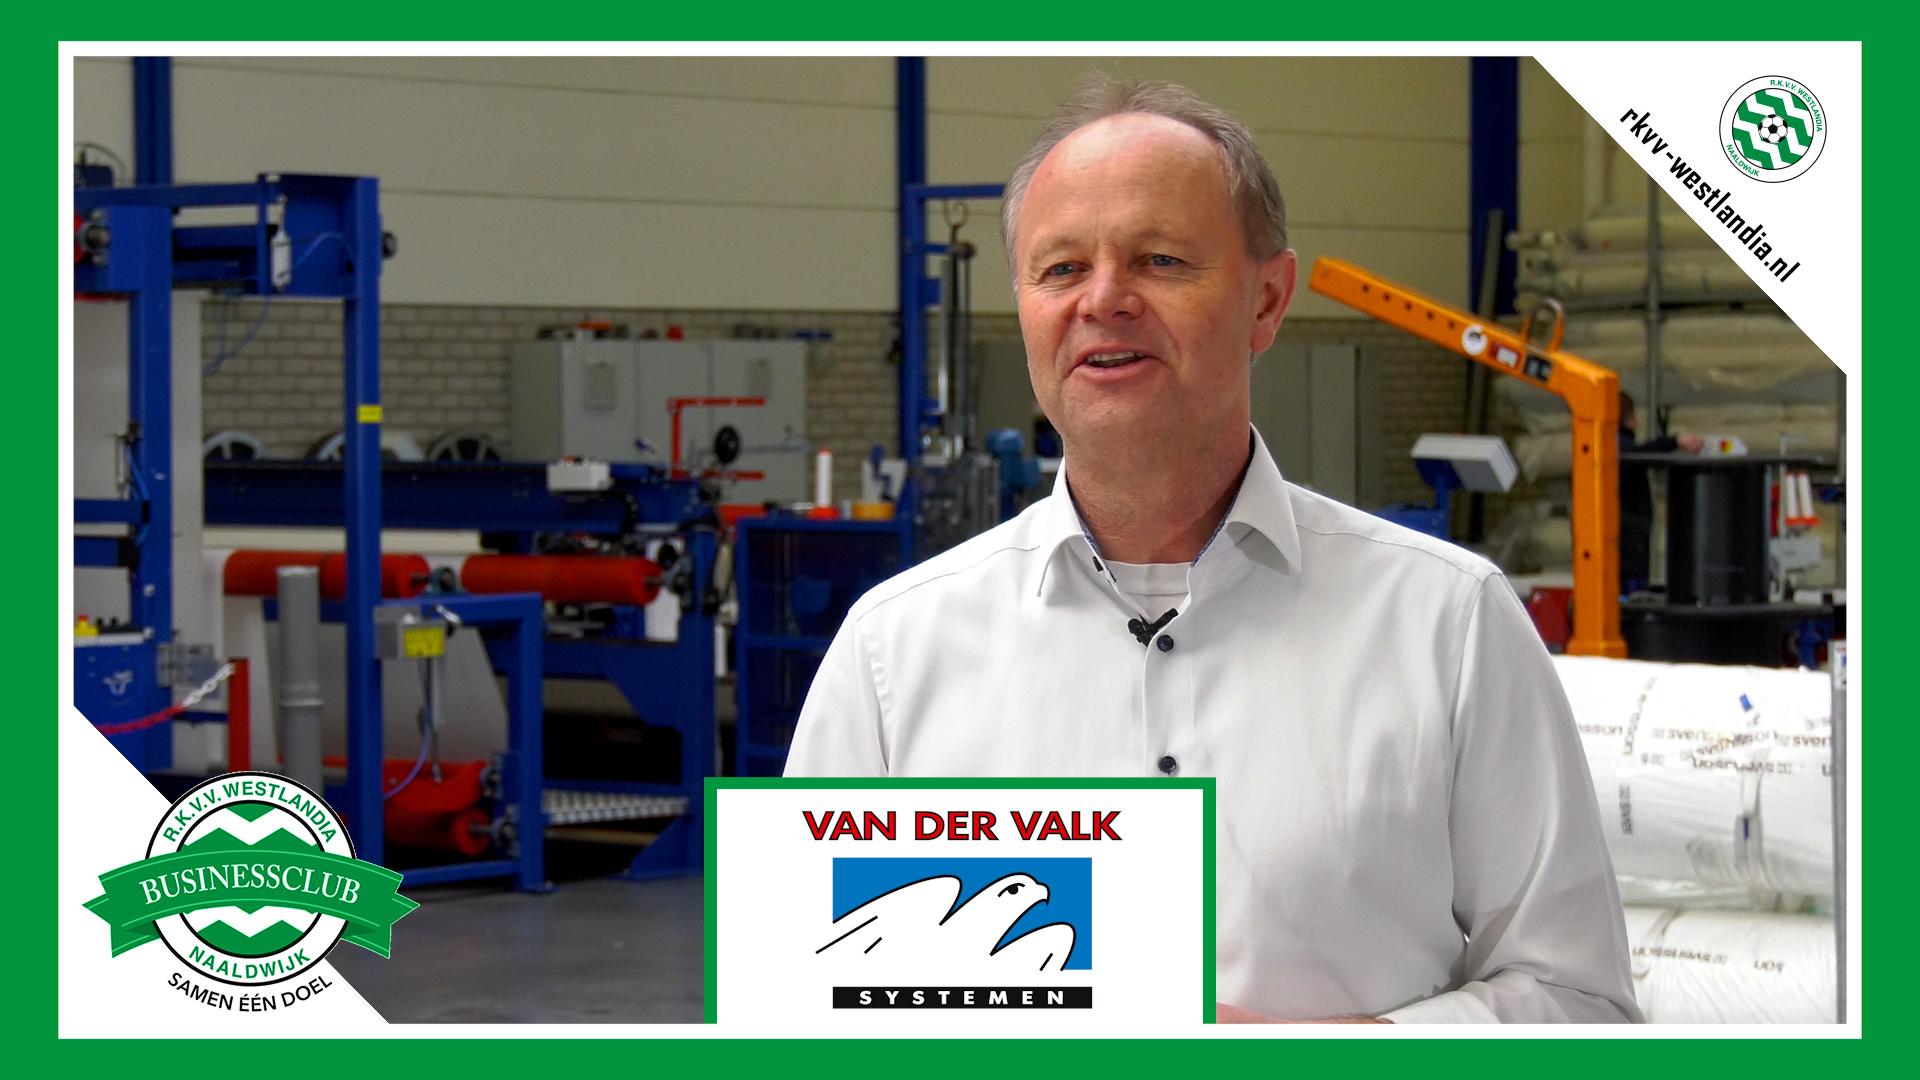 Van der Valk X Westlandia - 'Wat doet Van der Valk'?